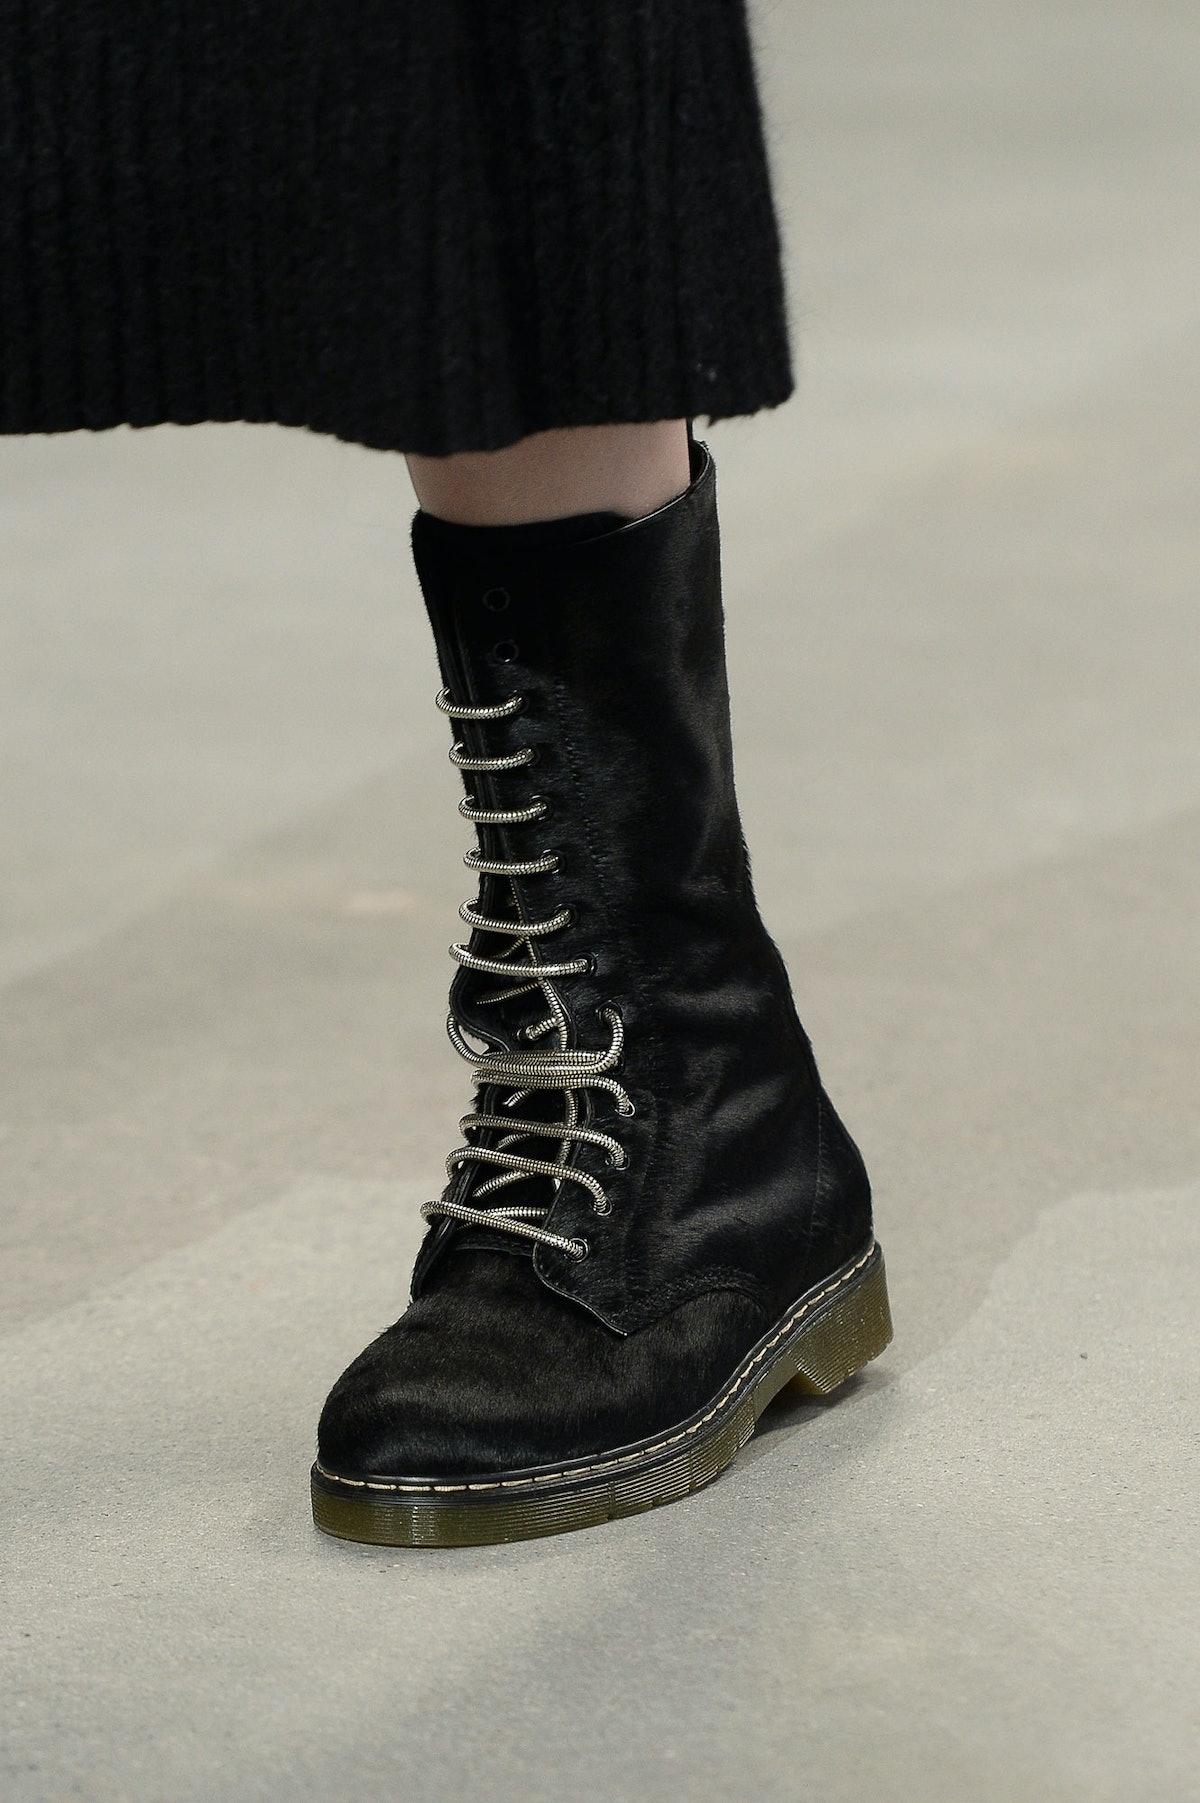 Calvin Klein Fall 2014 Boots